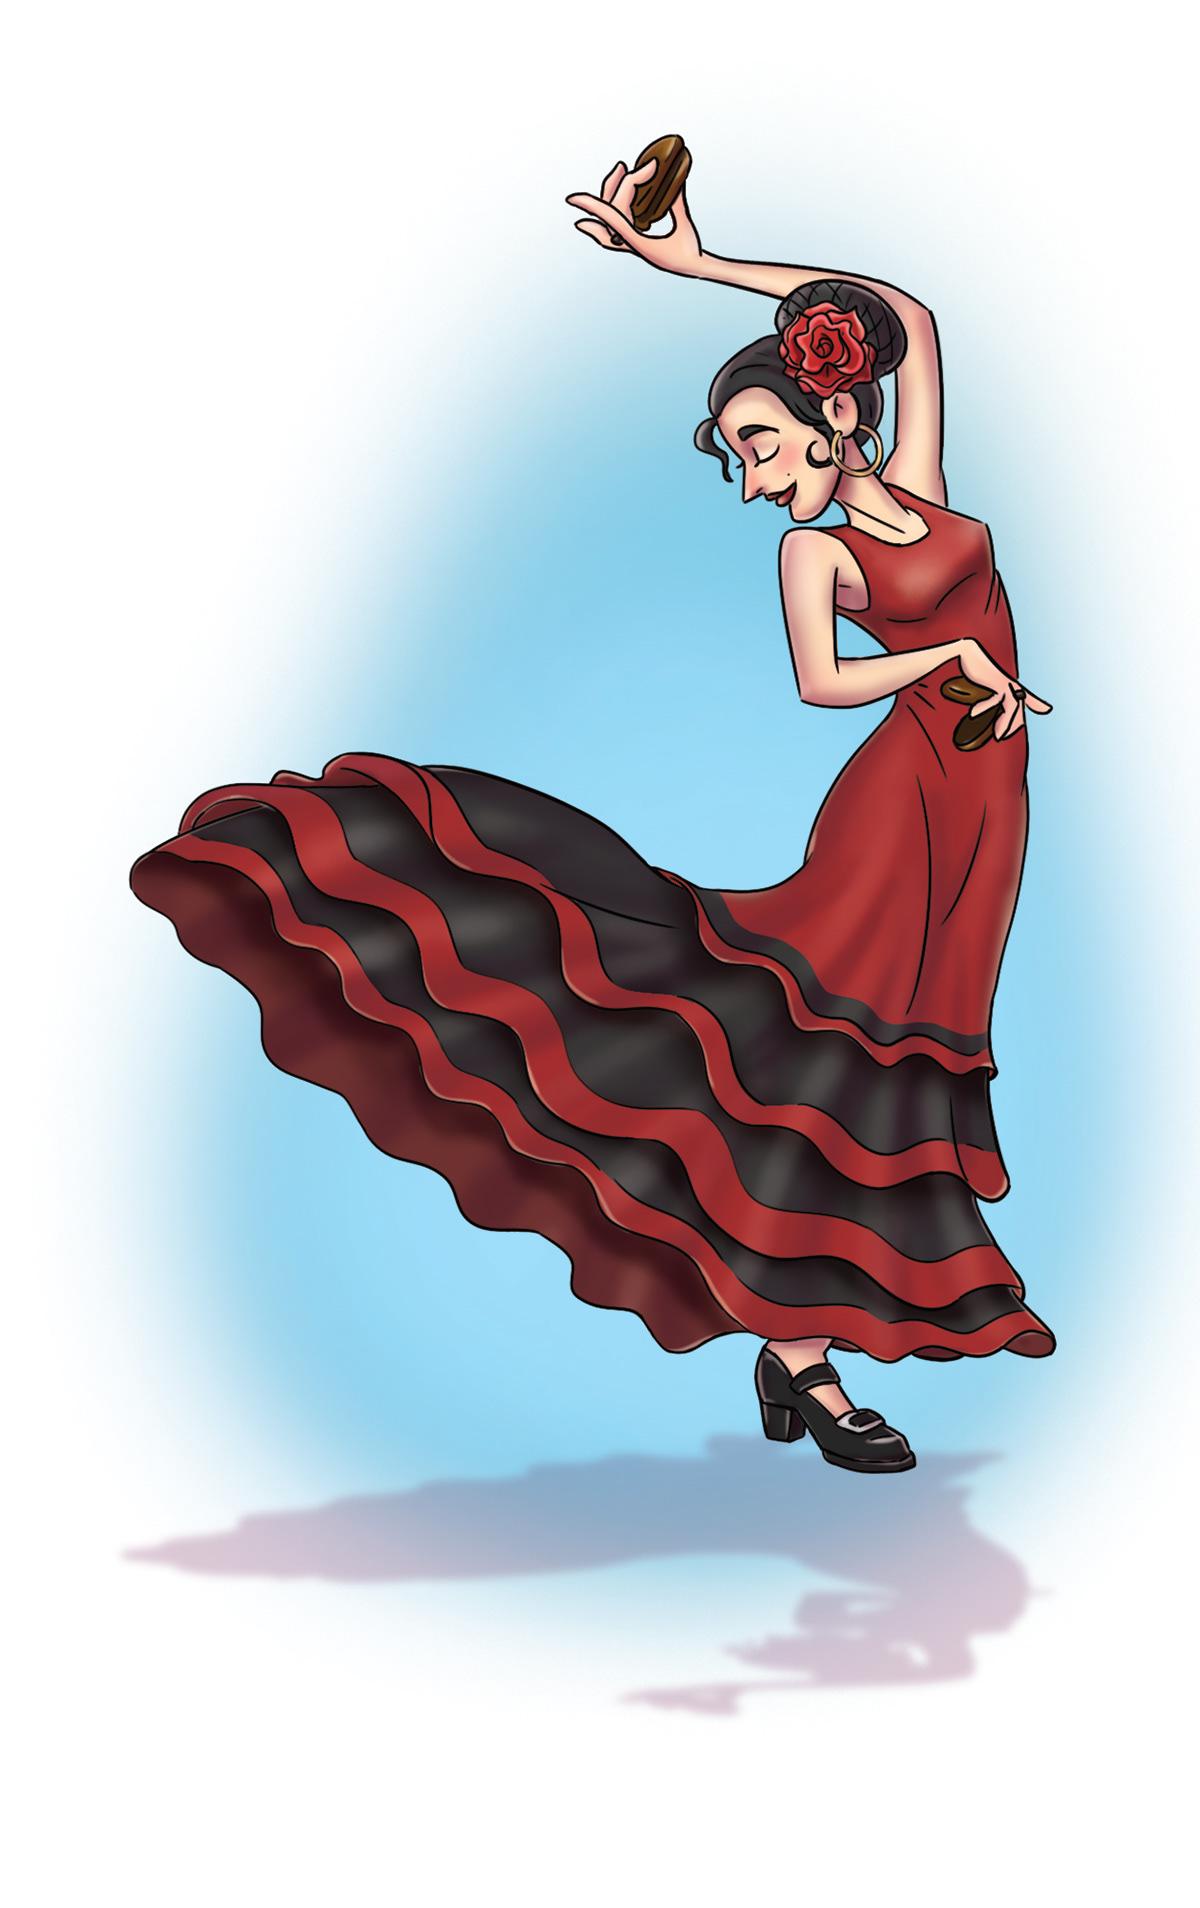 ballet Castle DANCE   dancing disco fantasy Flamenco irish king valsa